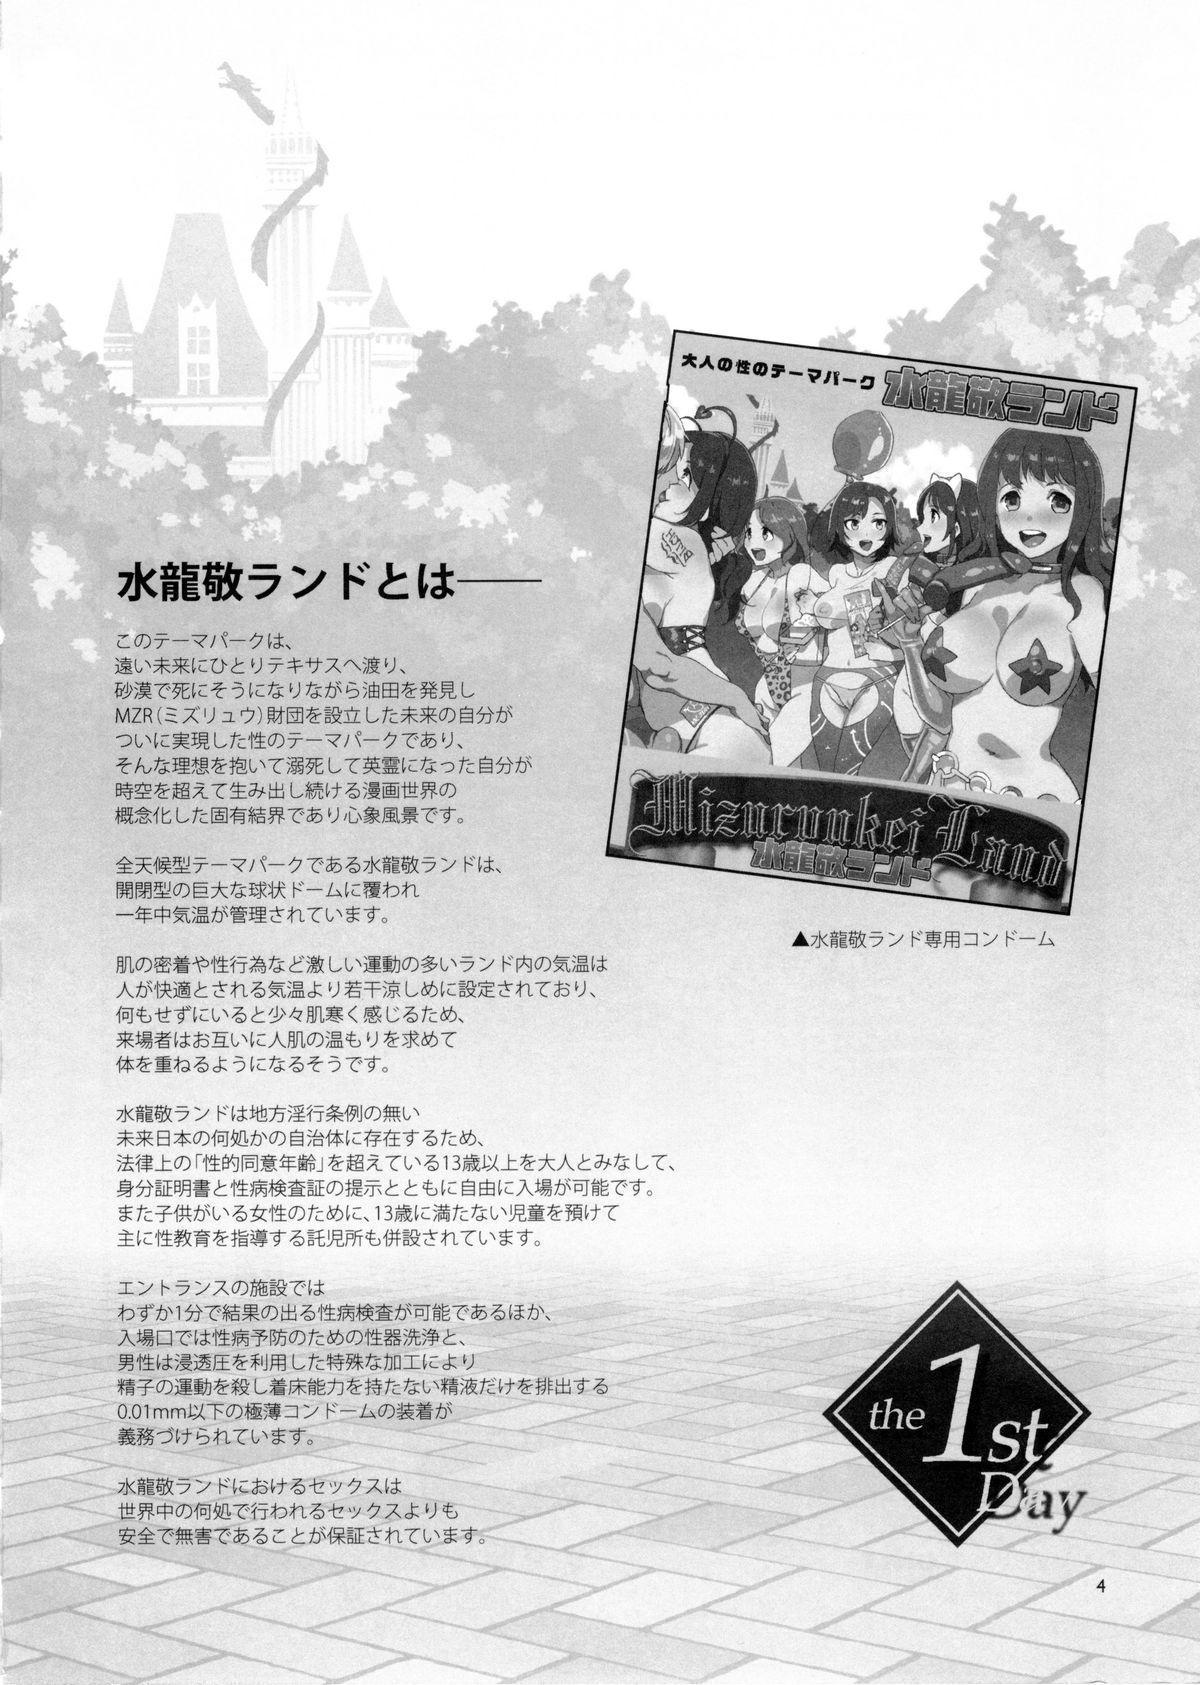 Oideyo! Mizuryu Kei Land the 1st Day 2